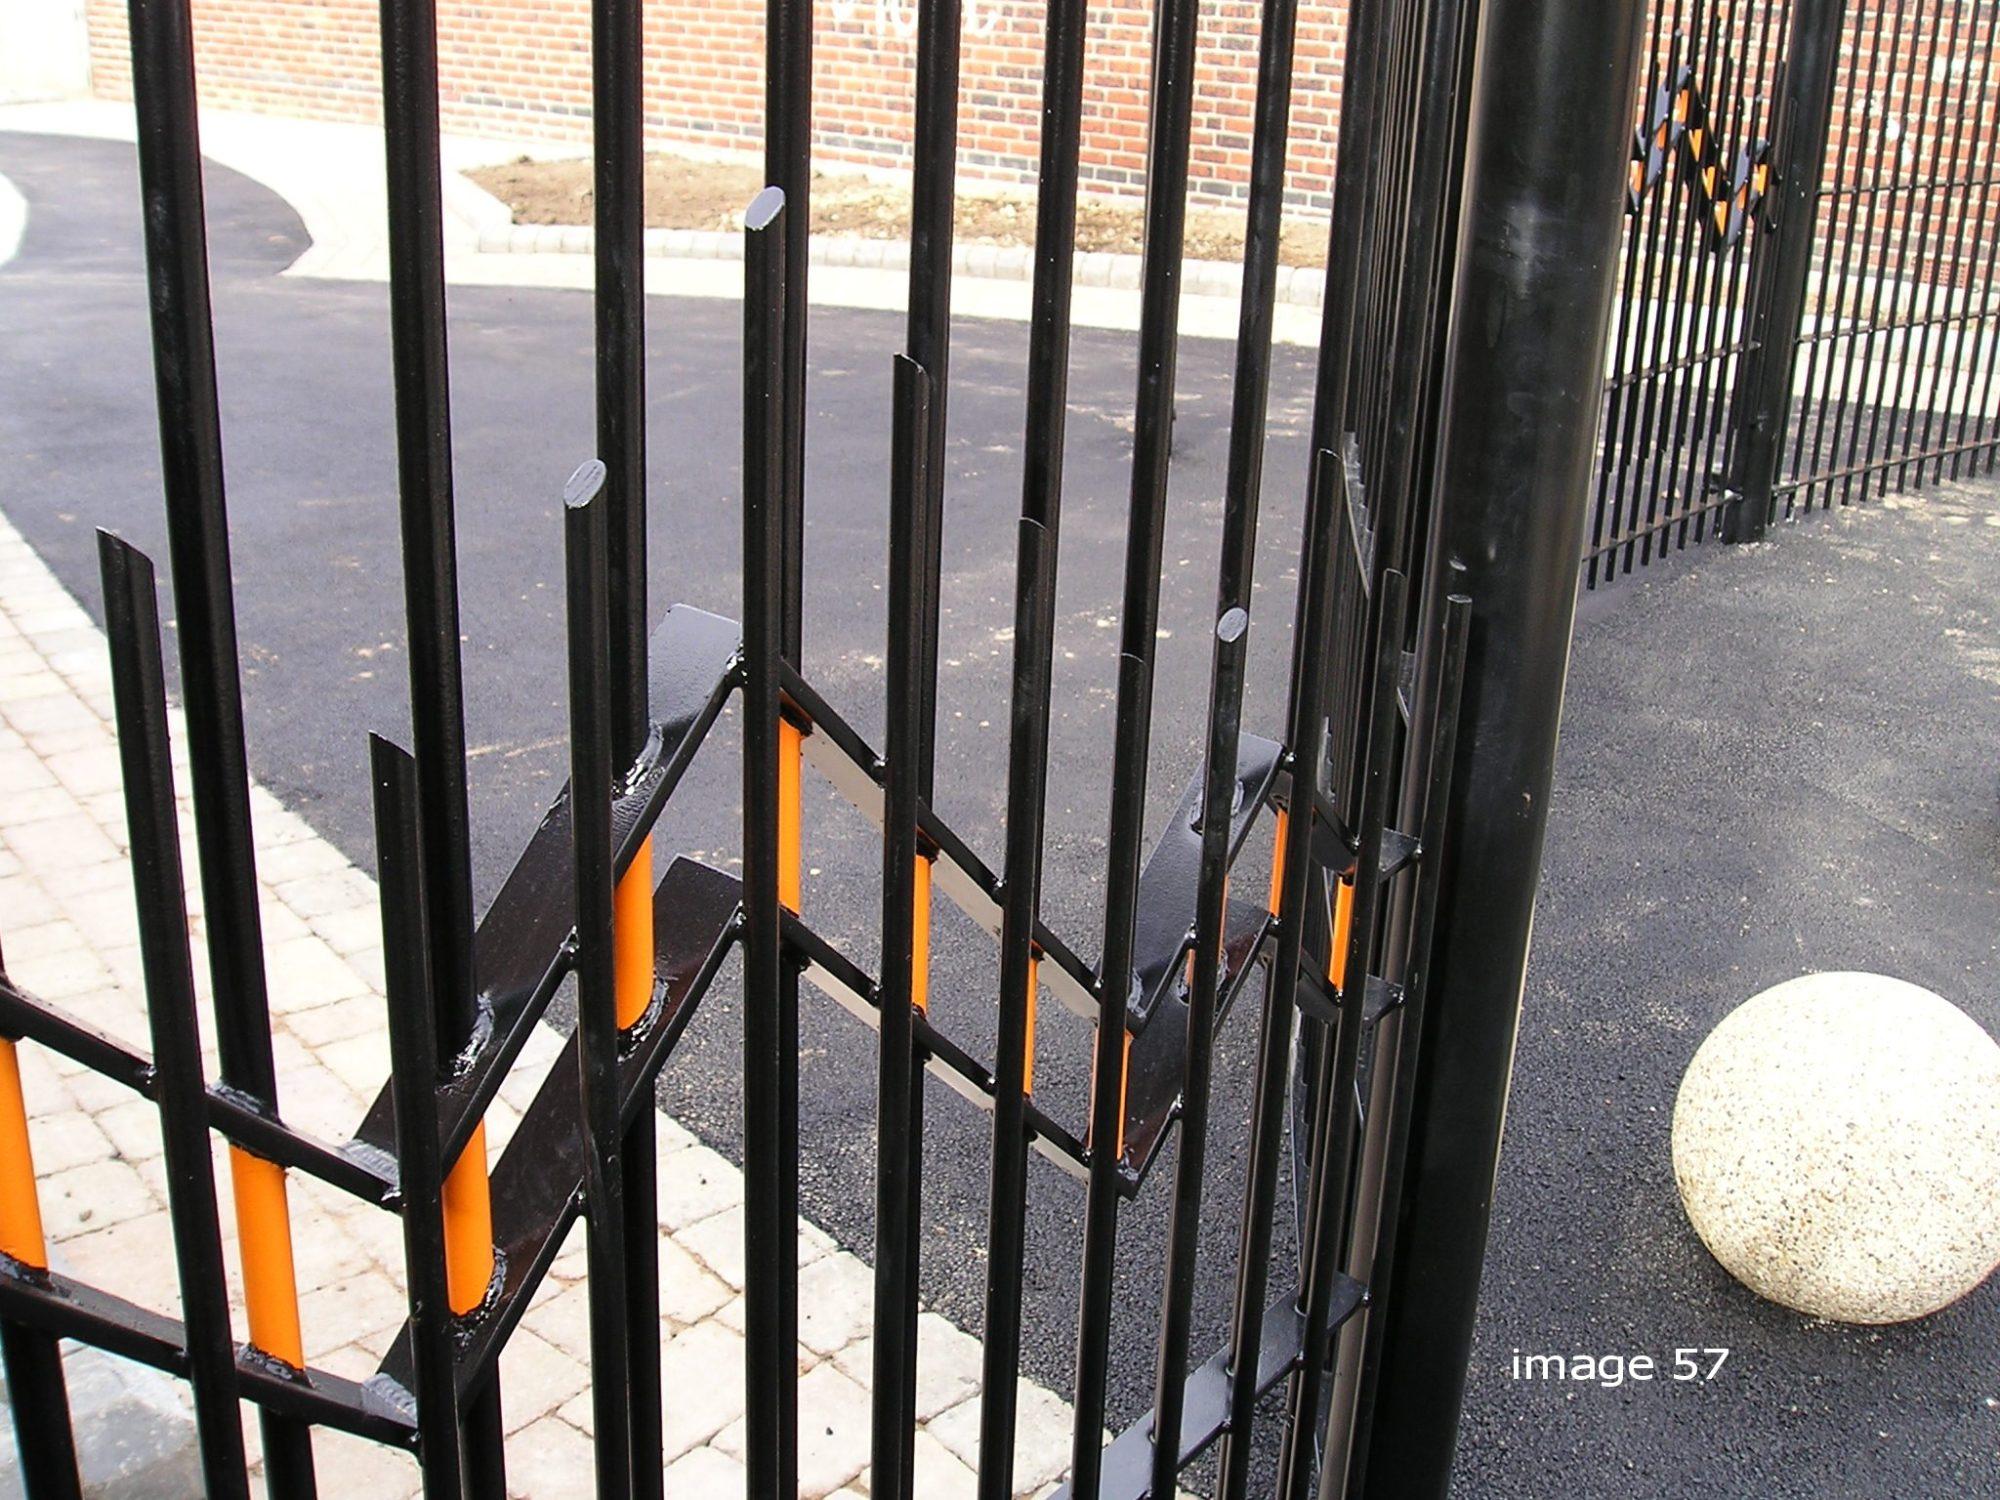 Bespoke decorative vertical bar railings